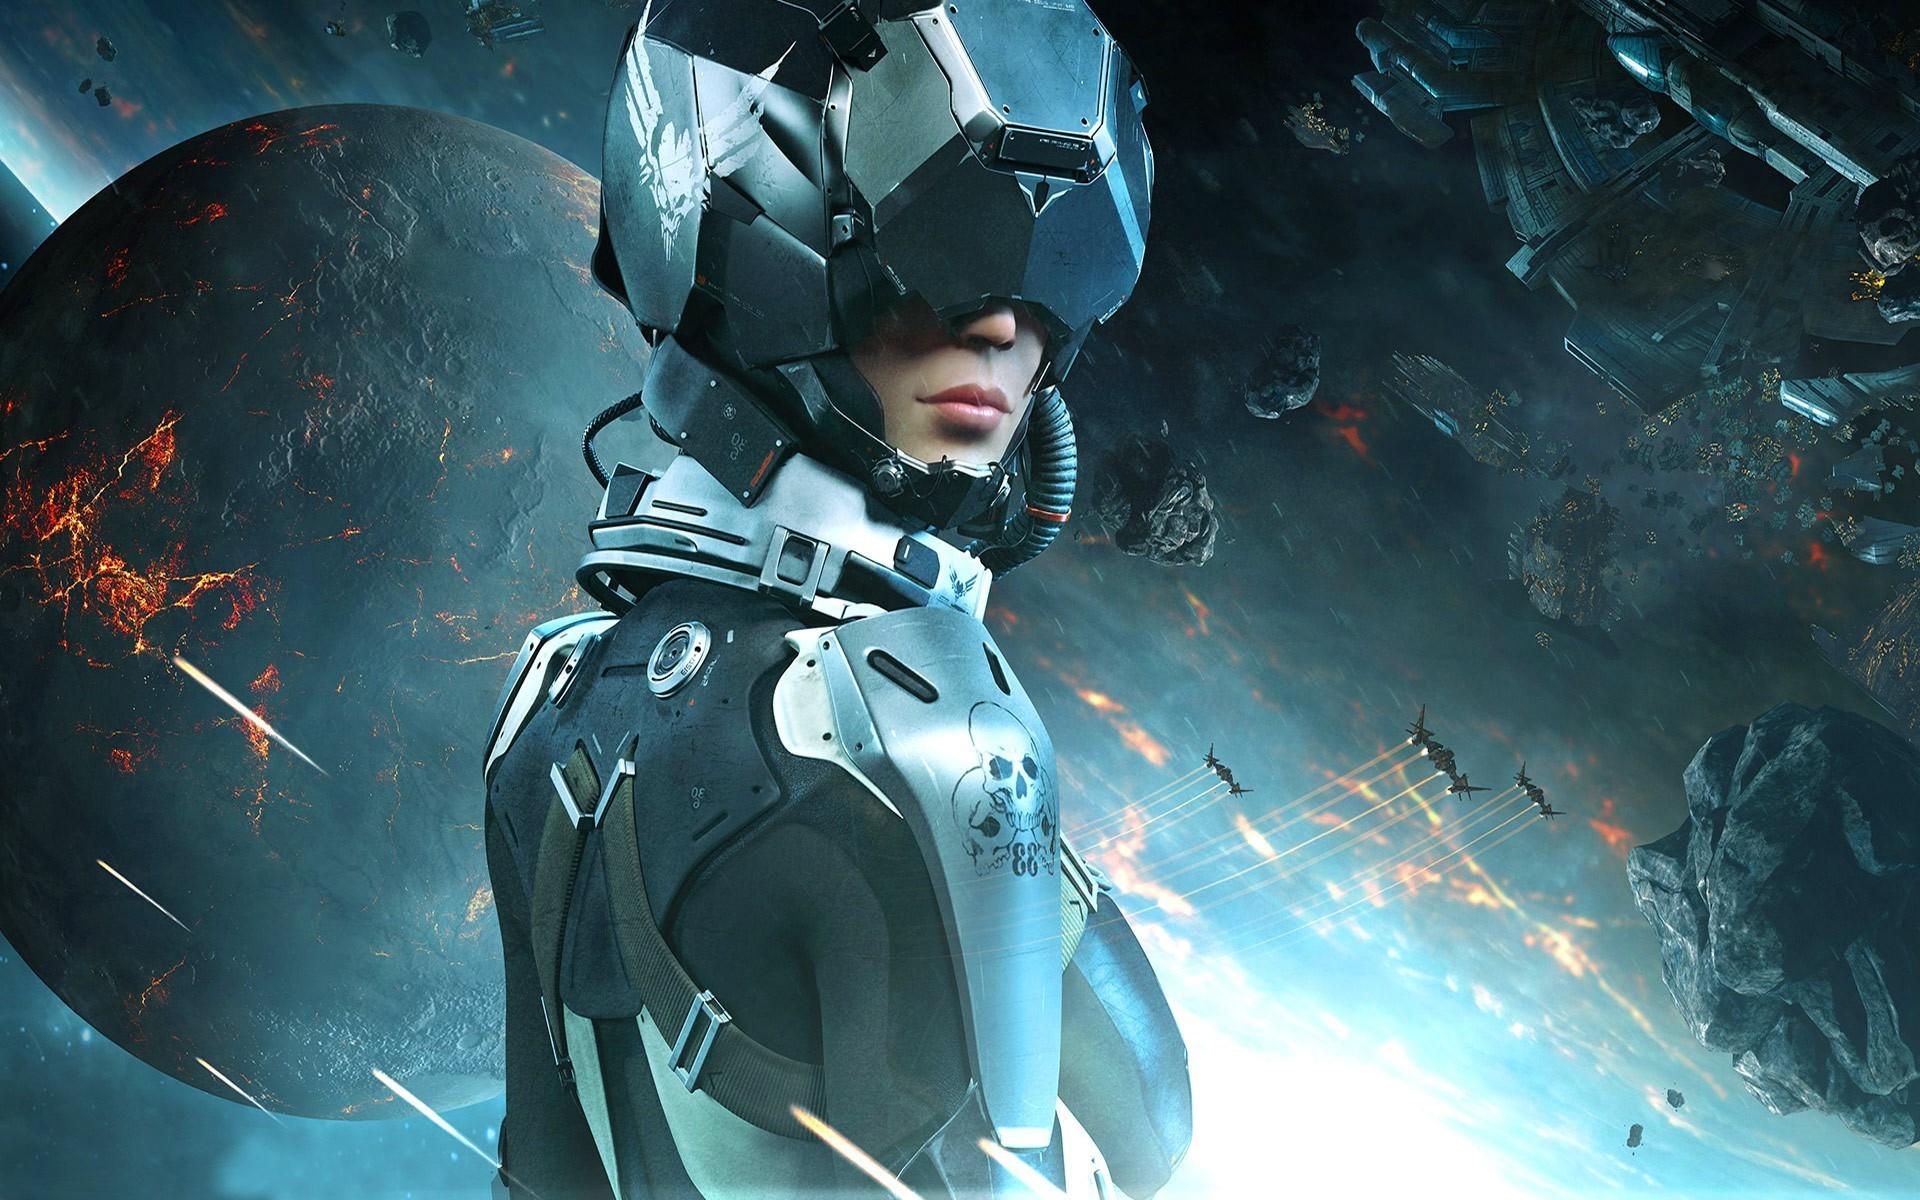 Eve Online Backgrounds (79+ Images